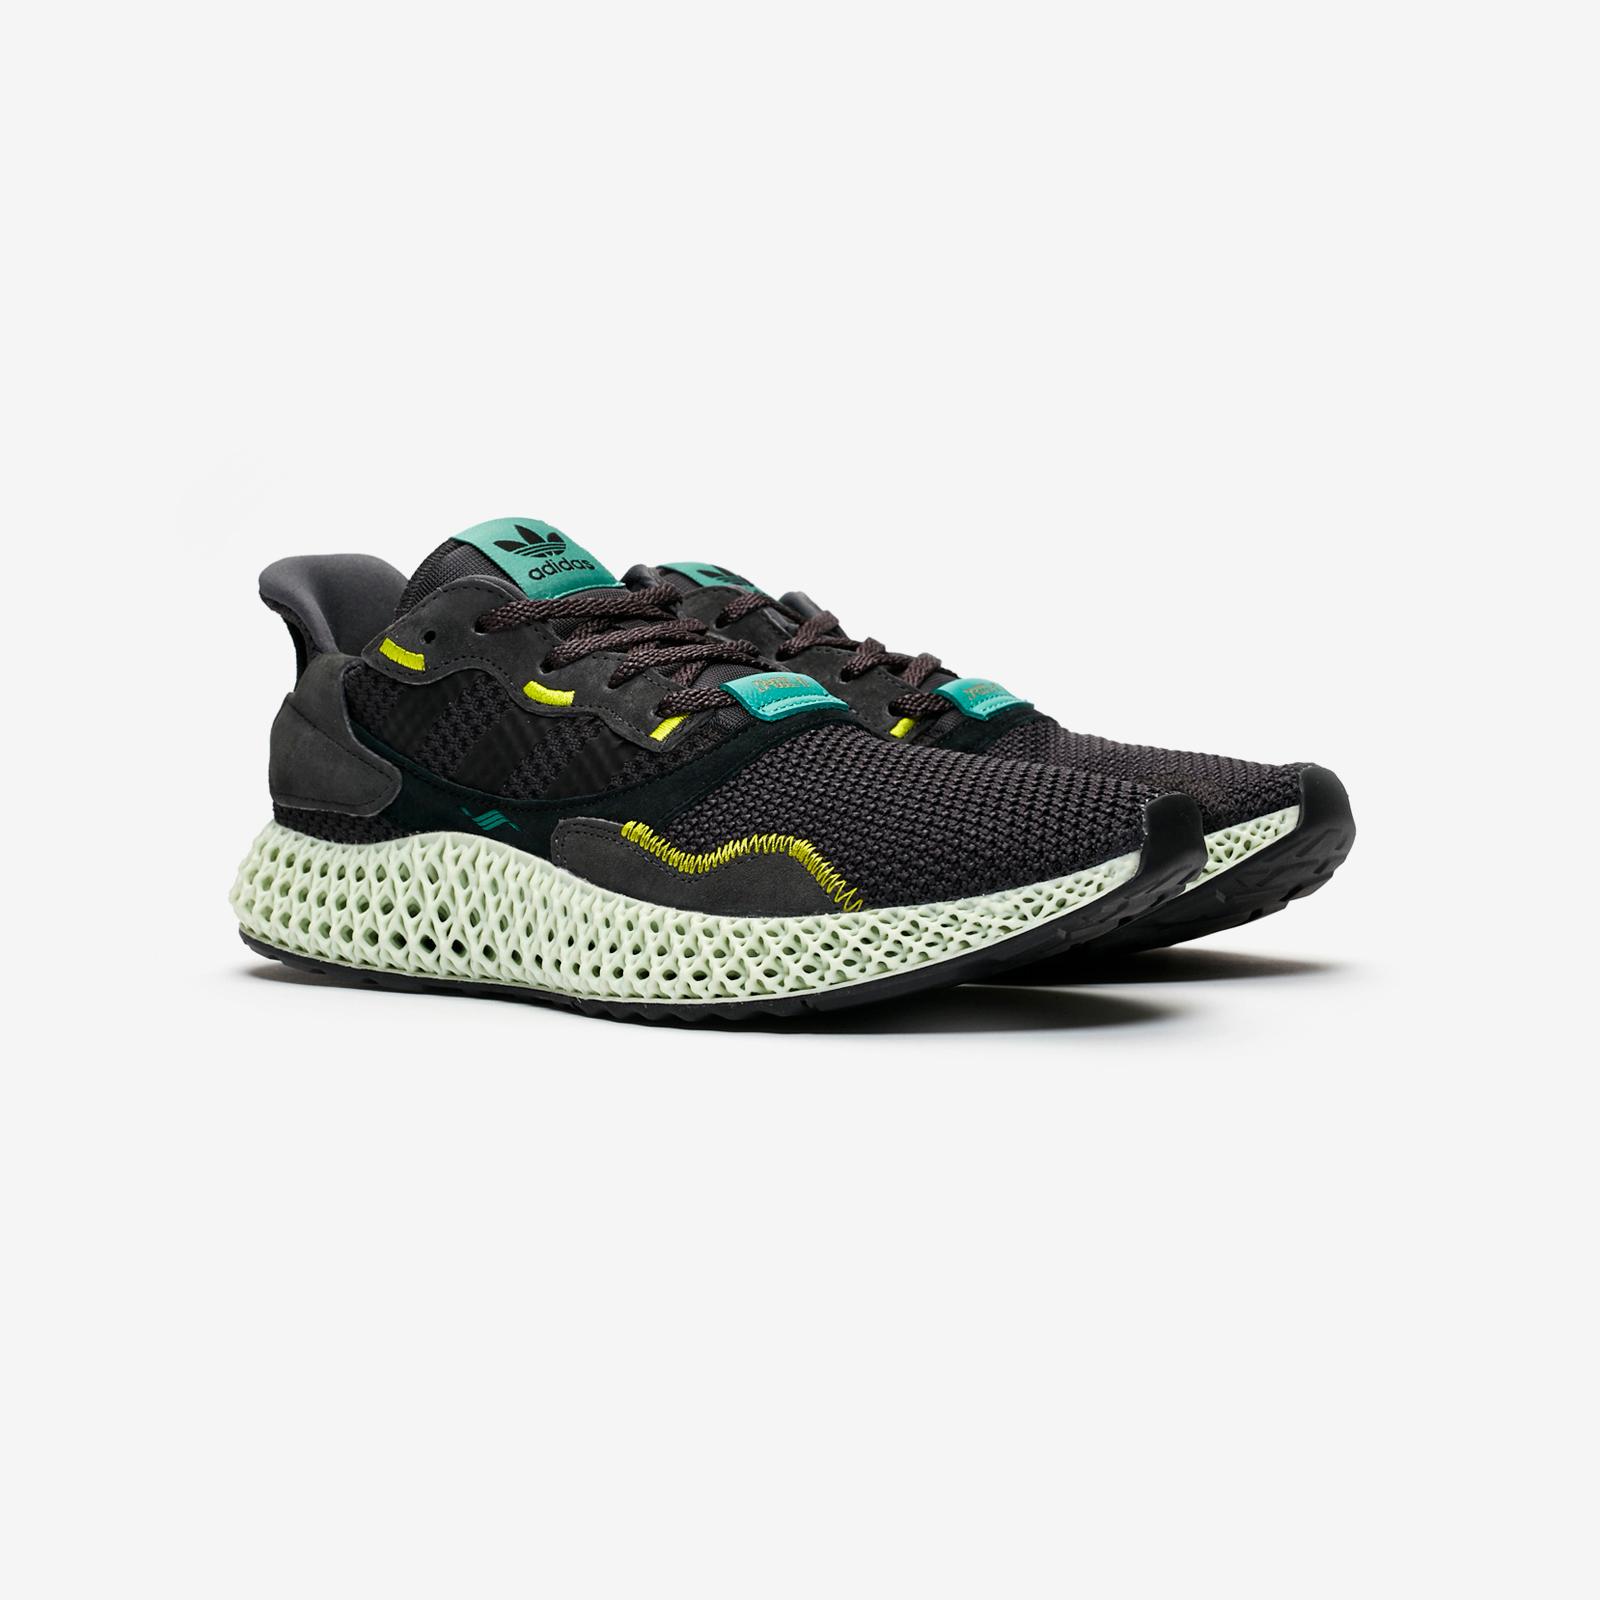 low priced cd041 77995 adidas ZX 4000 4D - Bd7865 - Sneakersnstuff   sneakers   streetwear online  since 1999